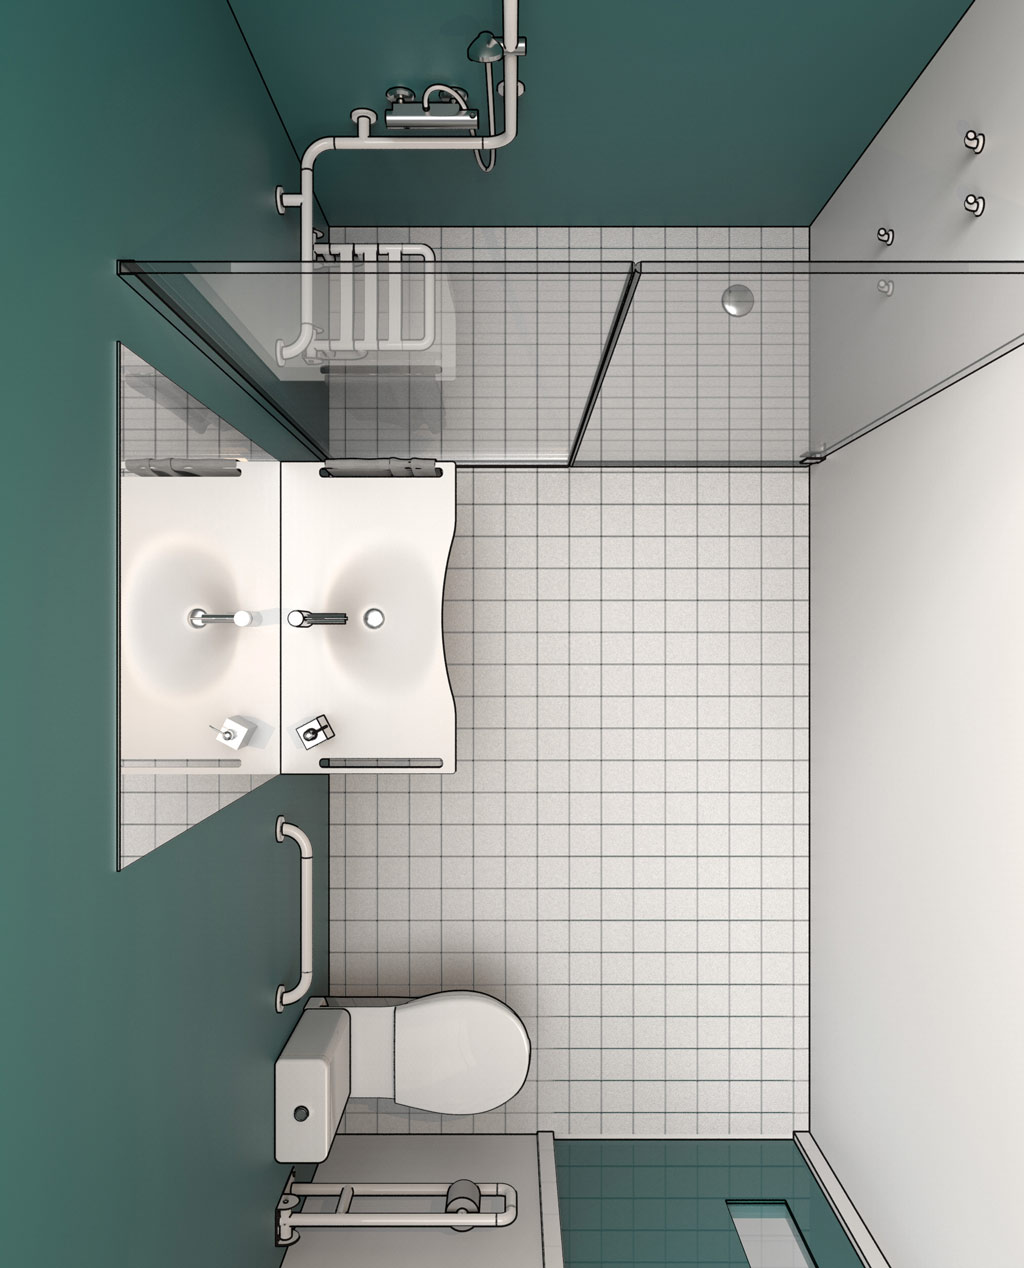 https://www.goman.it/img/goman_new/progettazione/bagno-per-ospedale.jpg